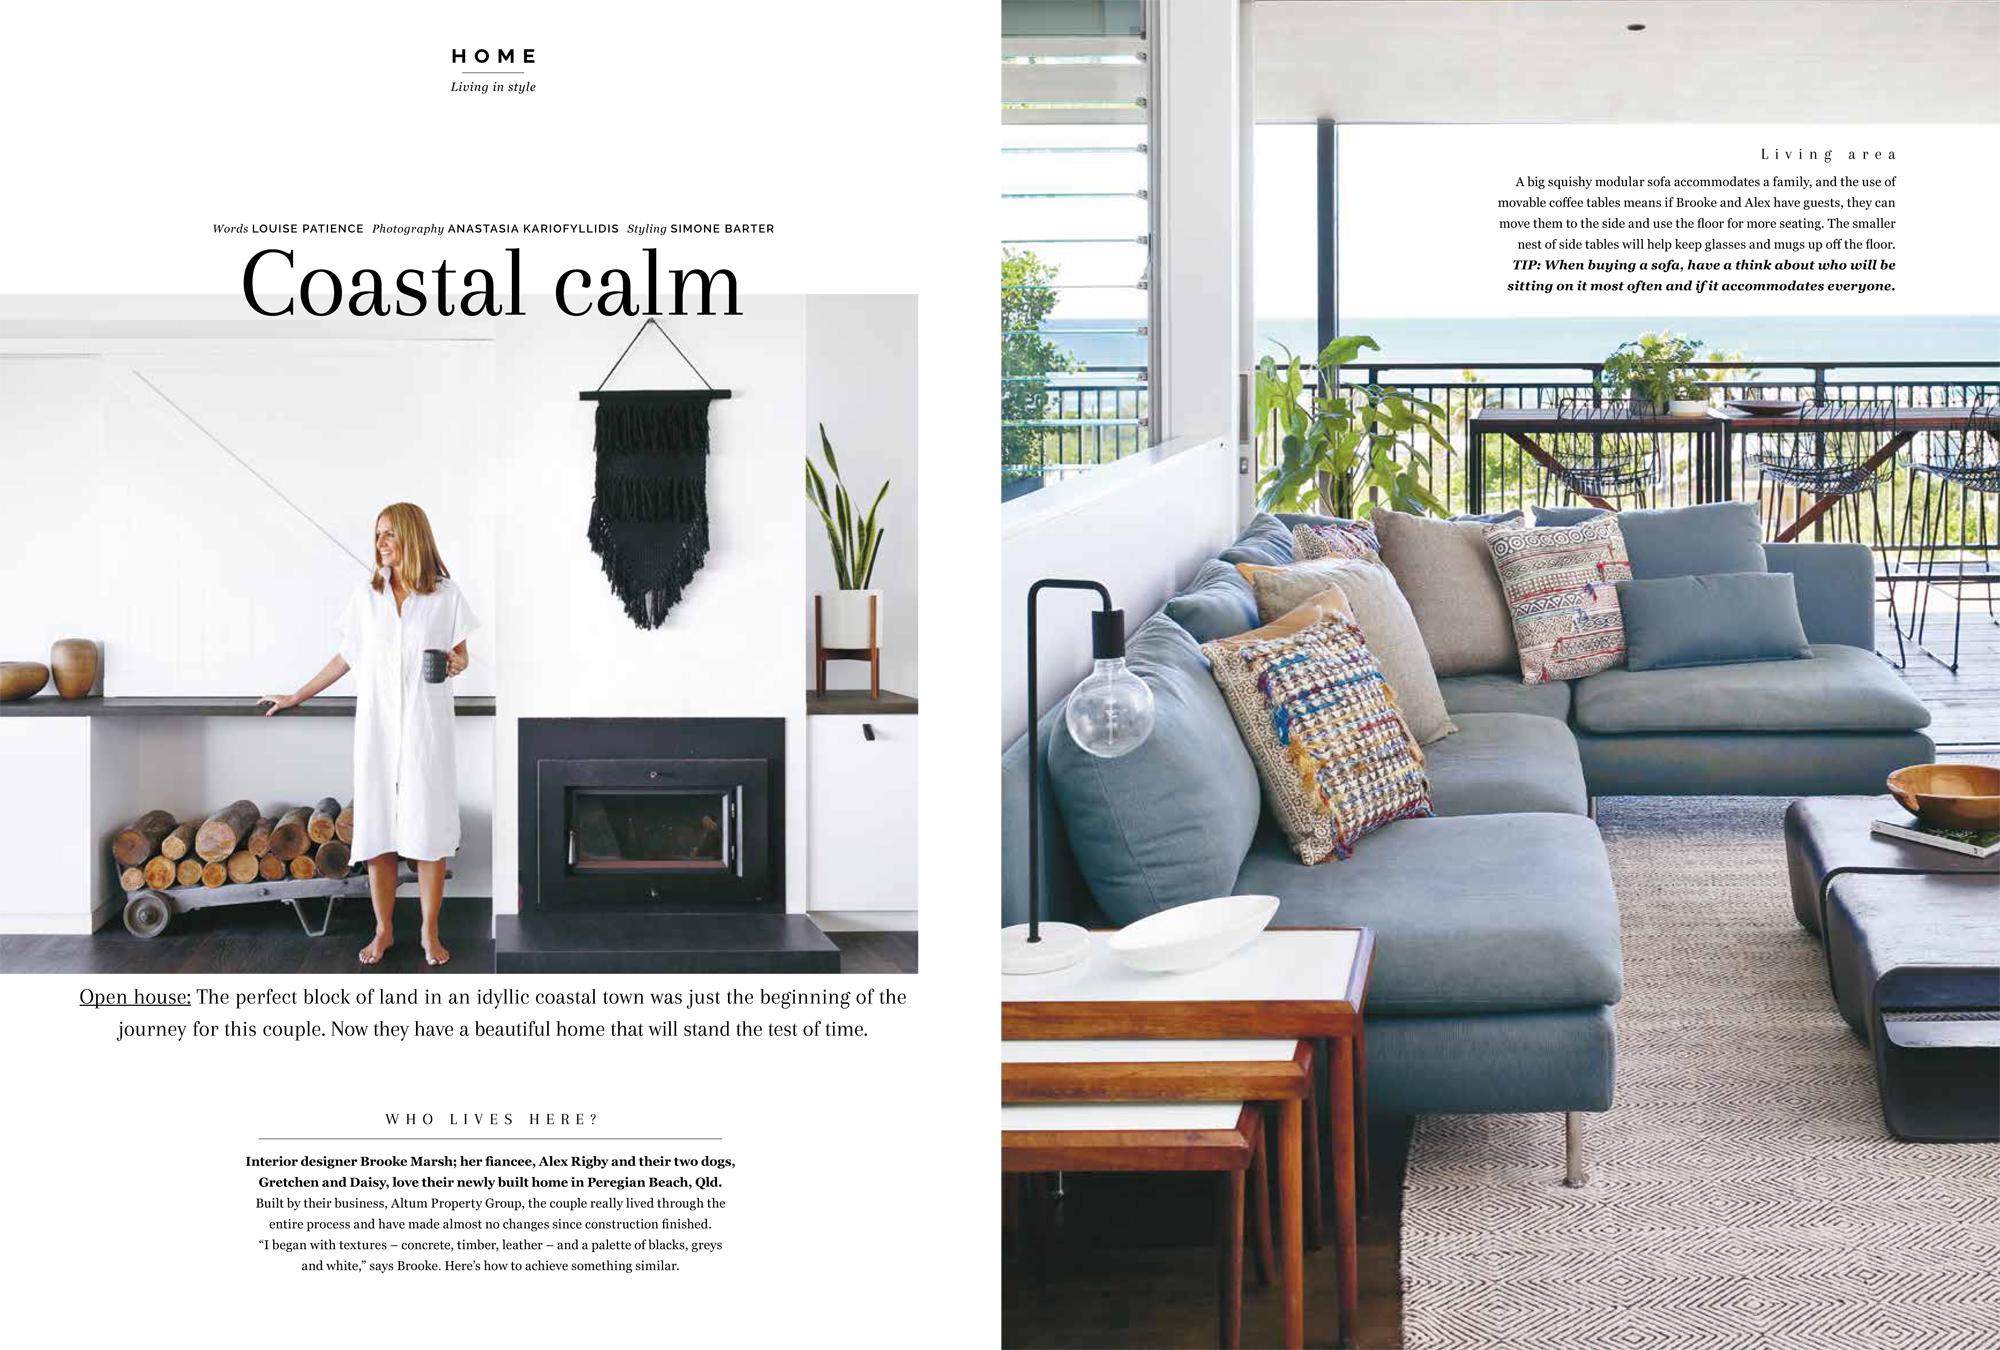 Home Life Magazine styled by Simone Barter-1.jpg